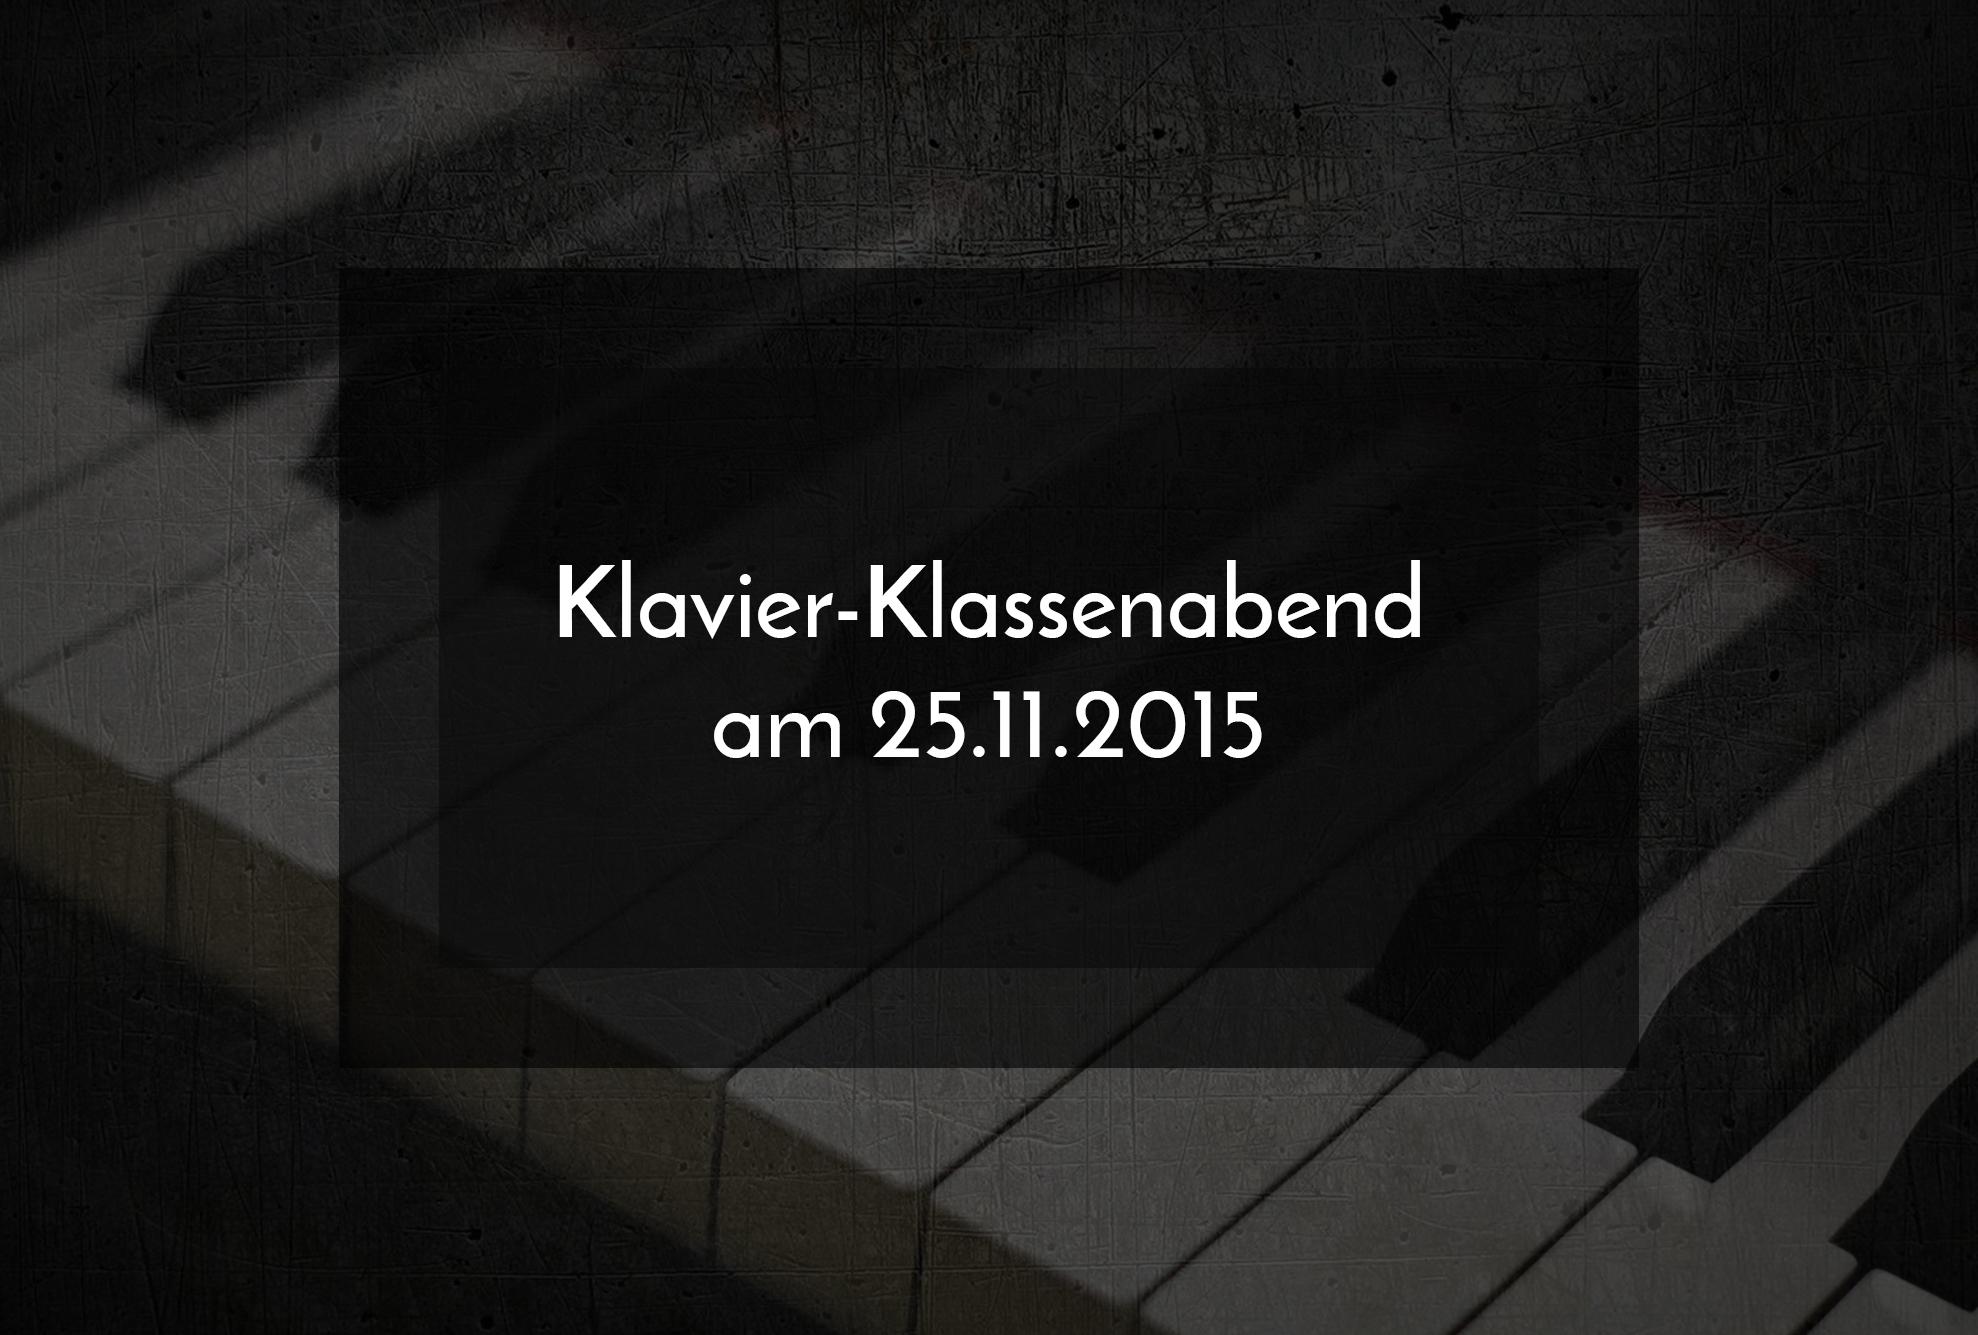 Klavier-Klassenabend am 25.11.2015